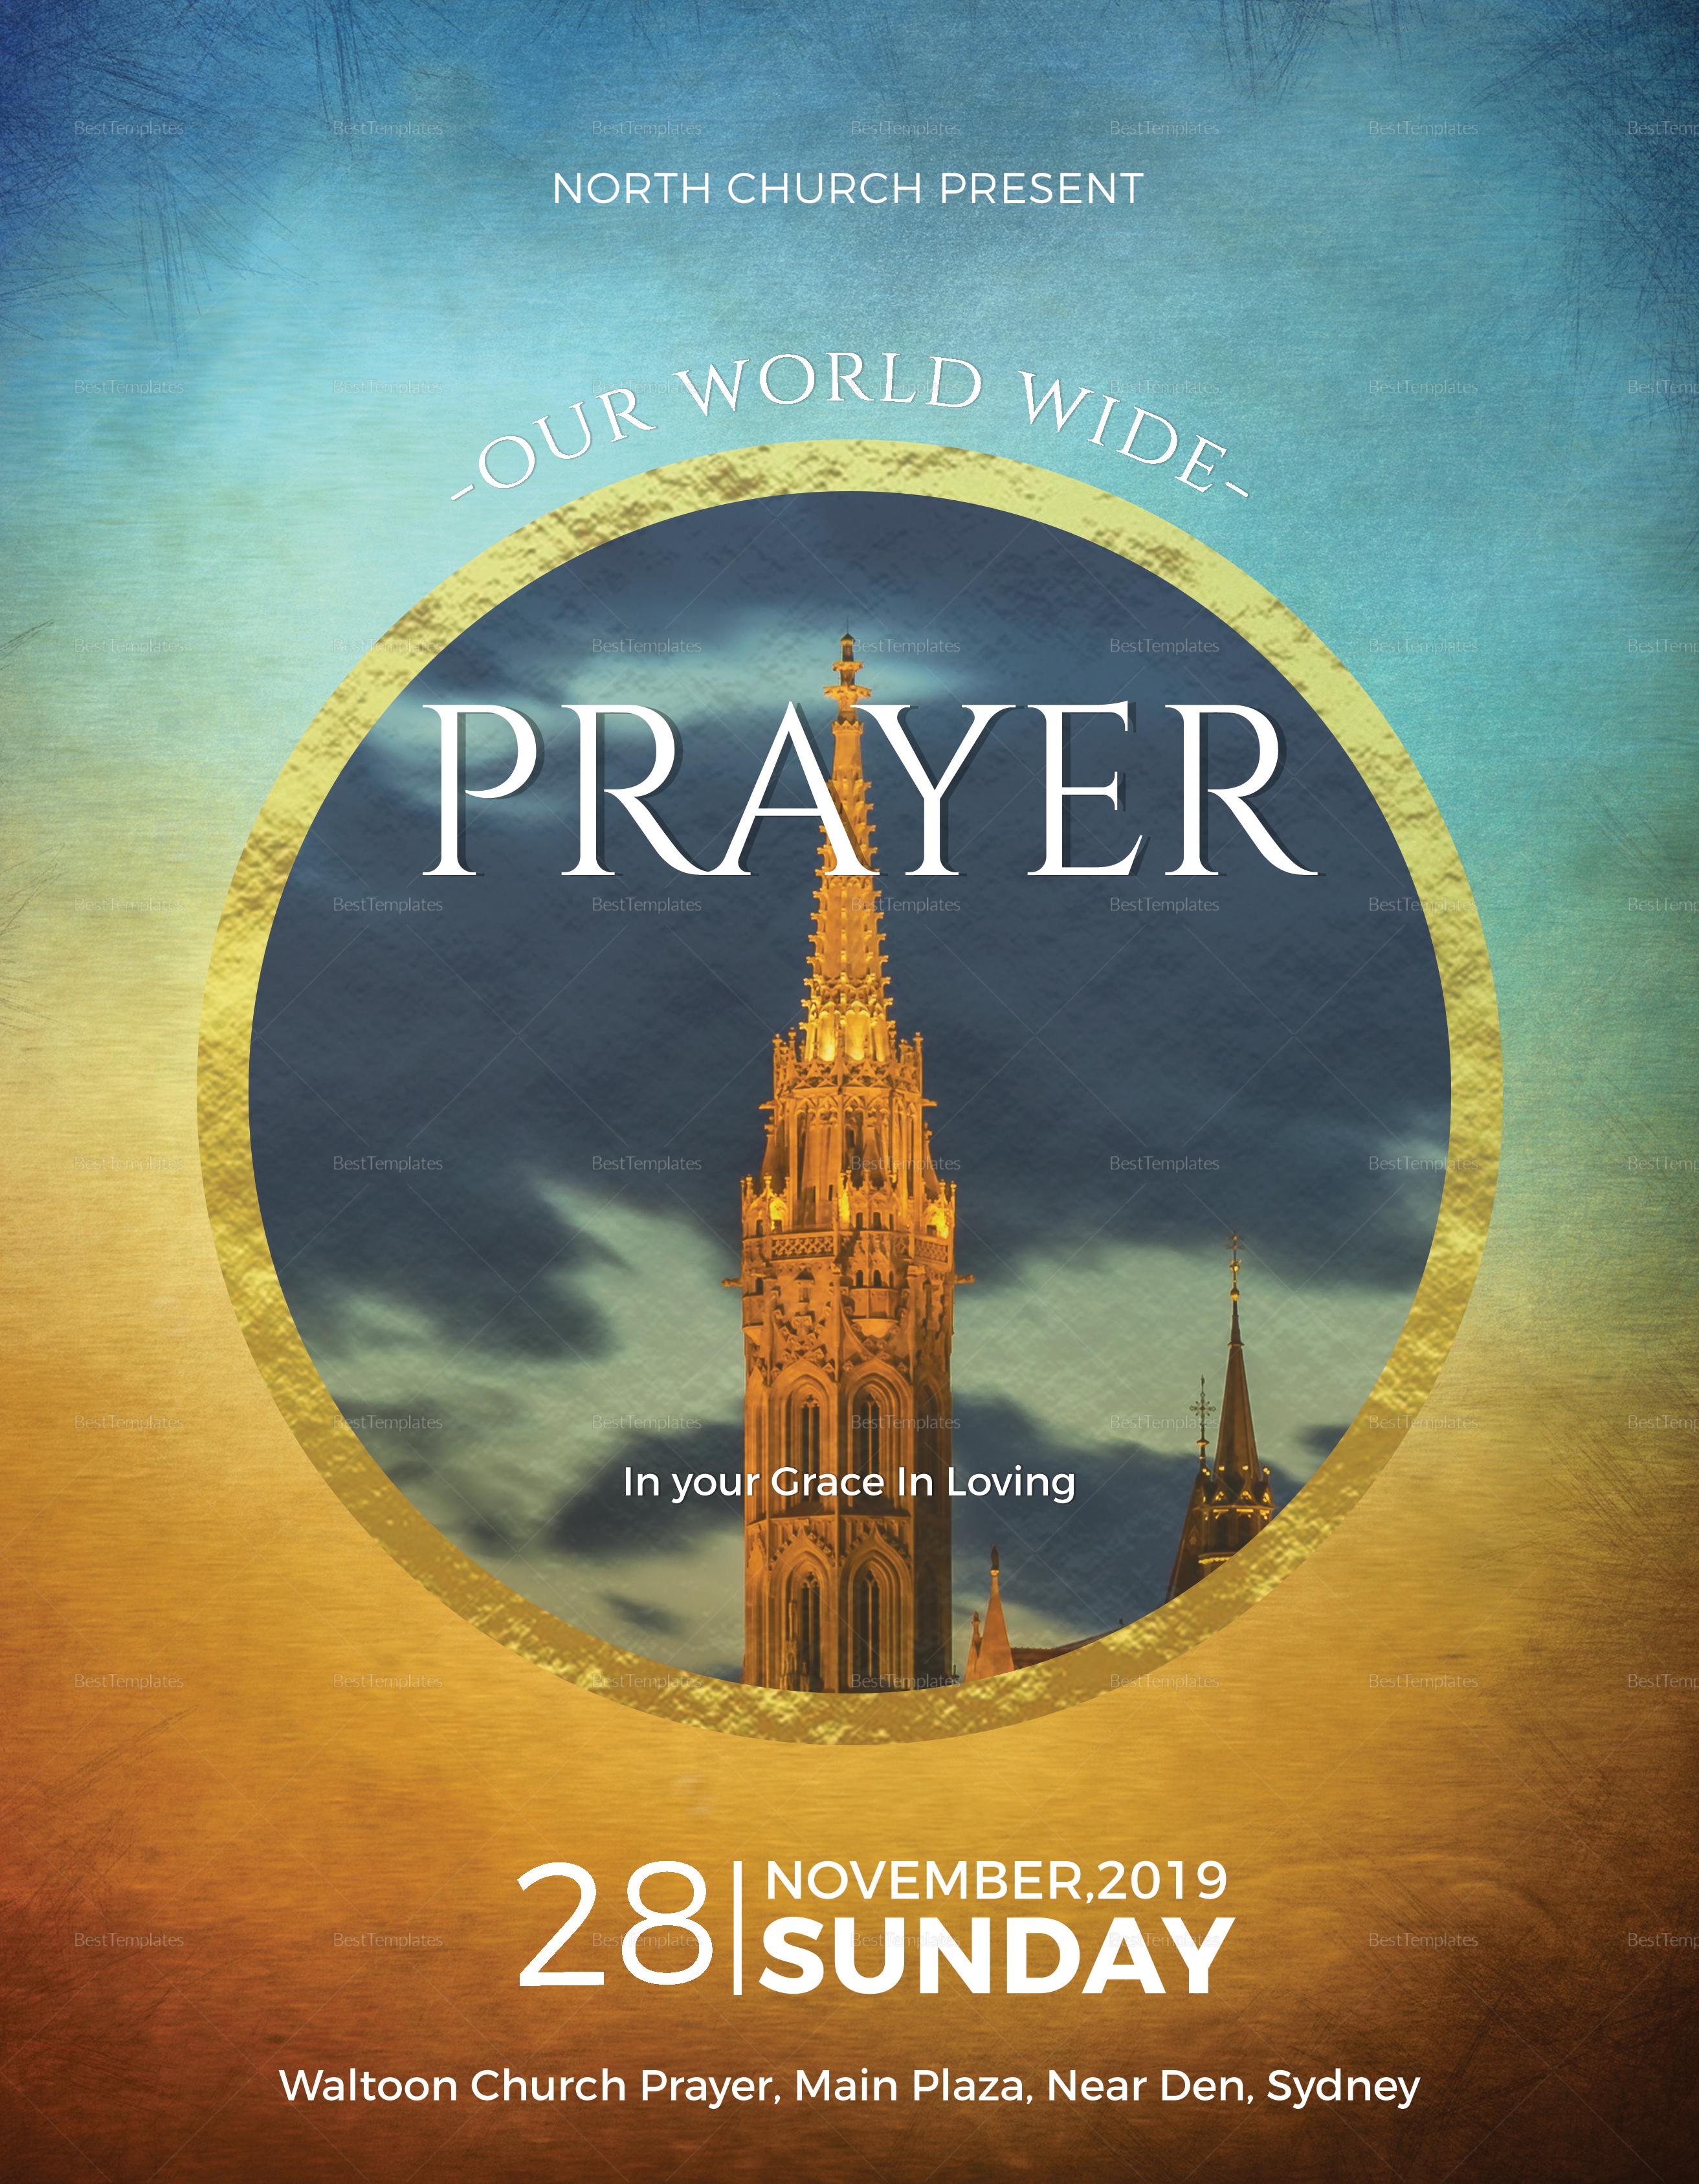 Gospel Church Flyer Design Template In Psd Word Publisher